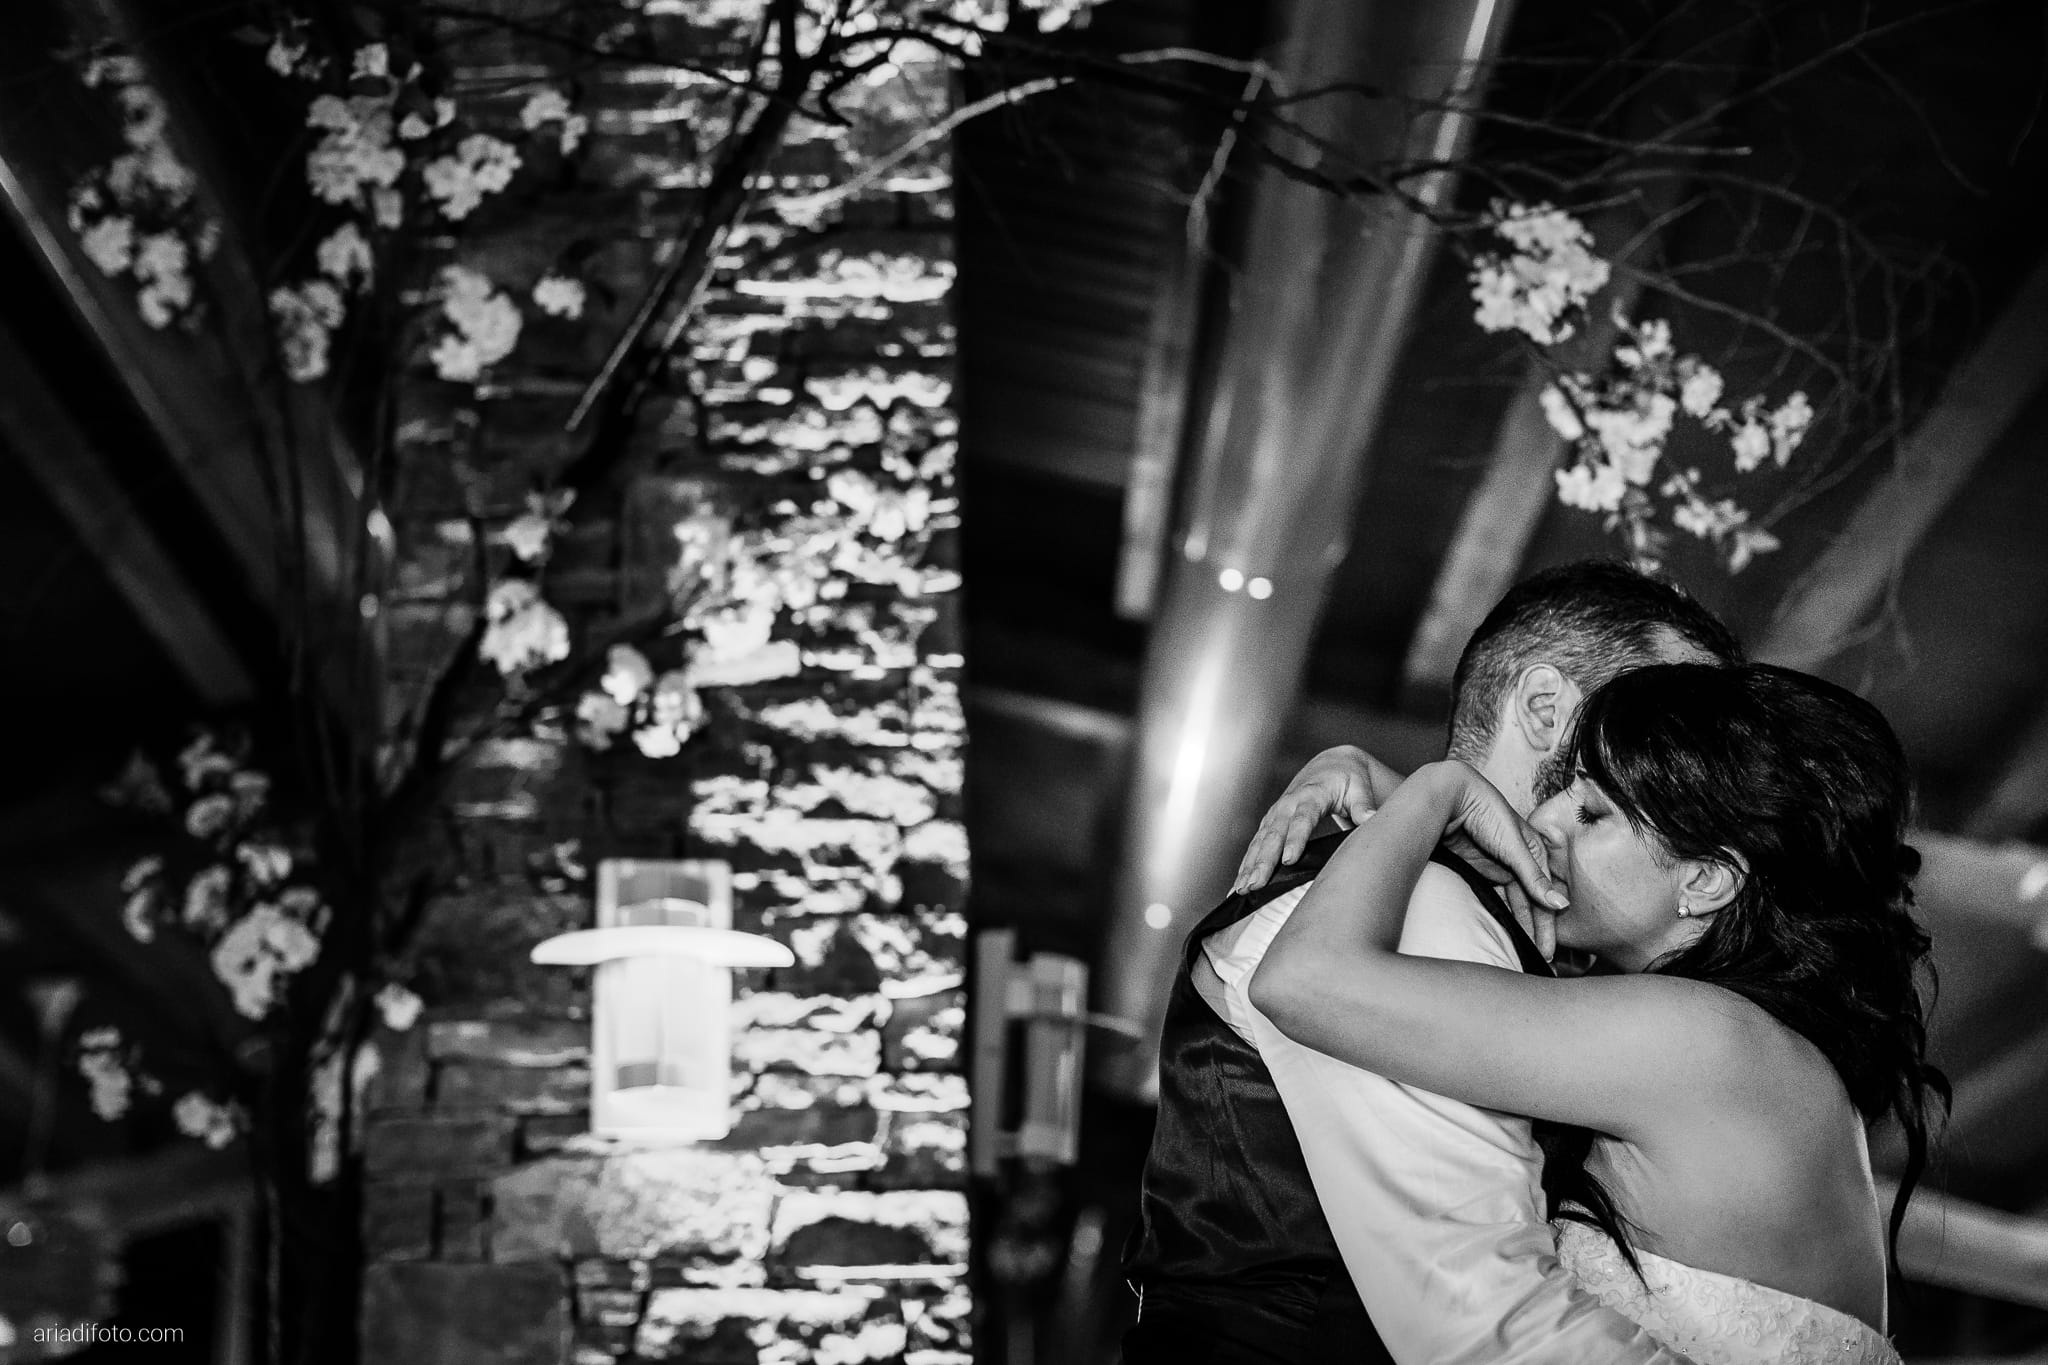 Rosylenia Luca Matrimonio Duino Ristorante Napoleone Castions Udine ricevimento primo ballo